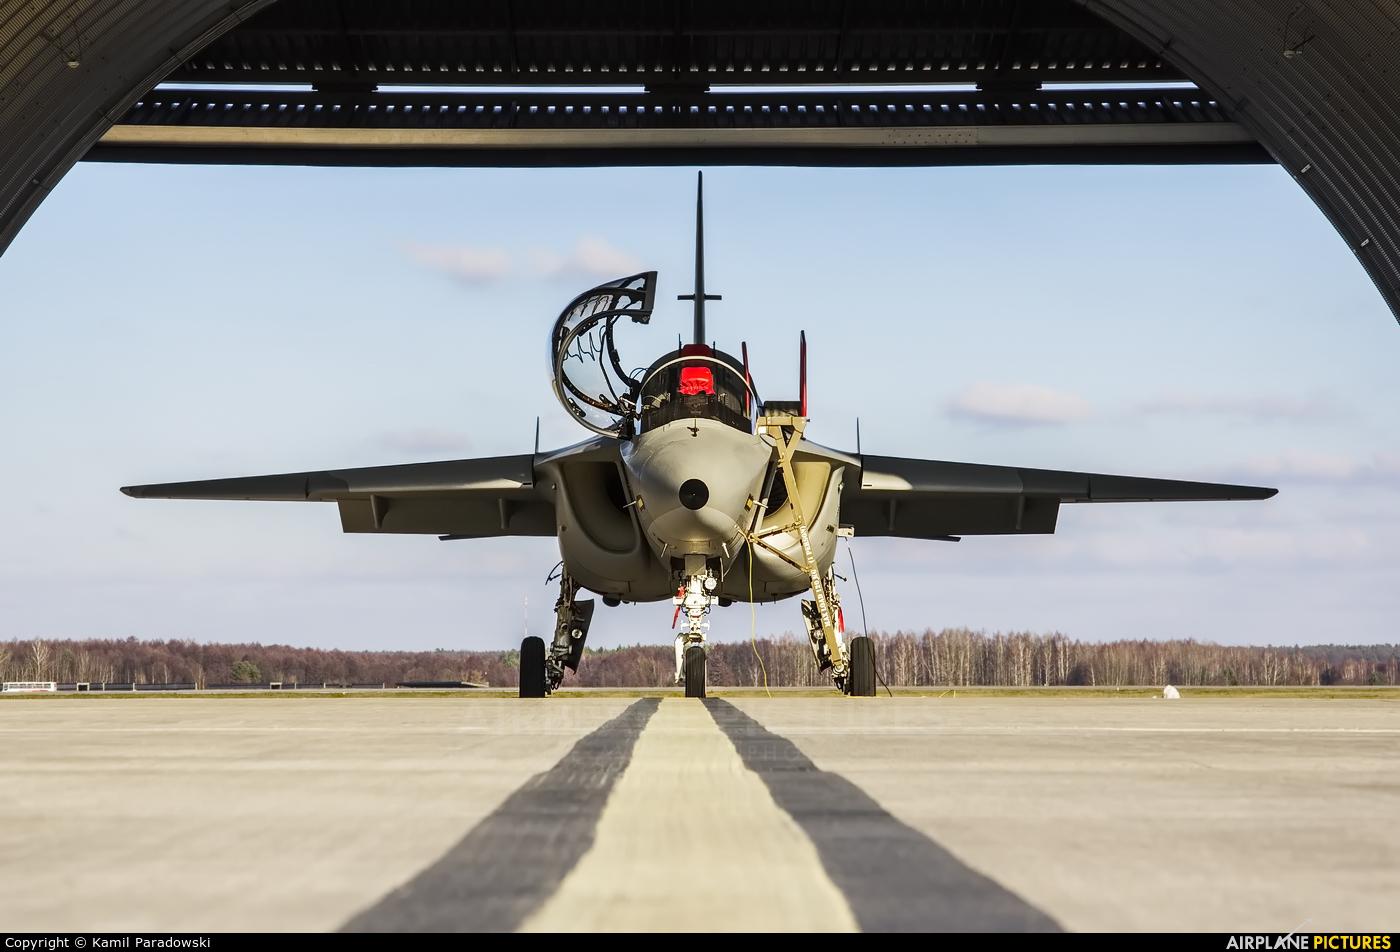 Poland - Air Force 7705 aircraft at Dęblin